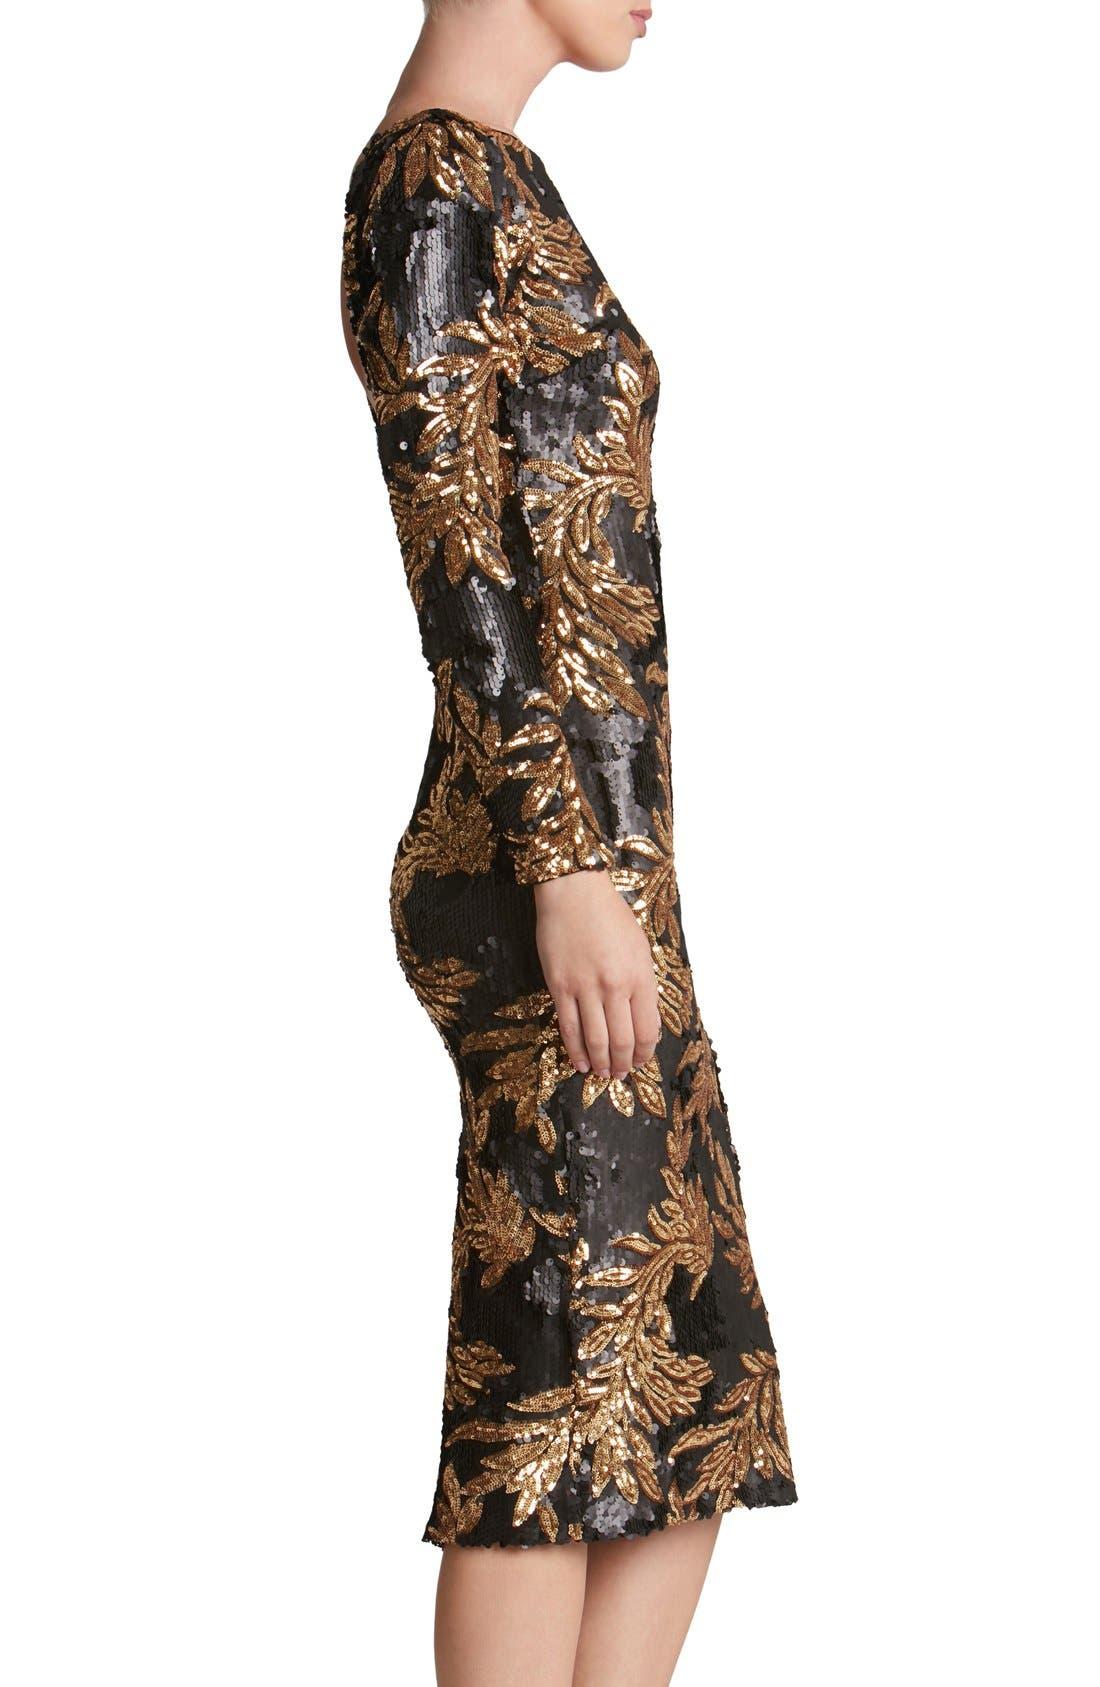 Alternate Image 3  - Dress the Population 'Emery' Scoop Back Two-Tone Sequin Sheath Dress